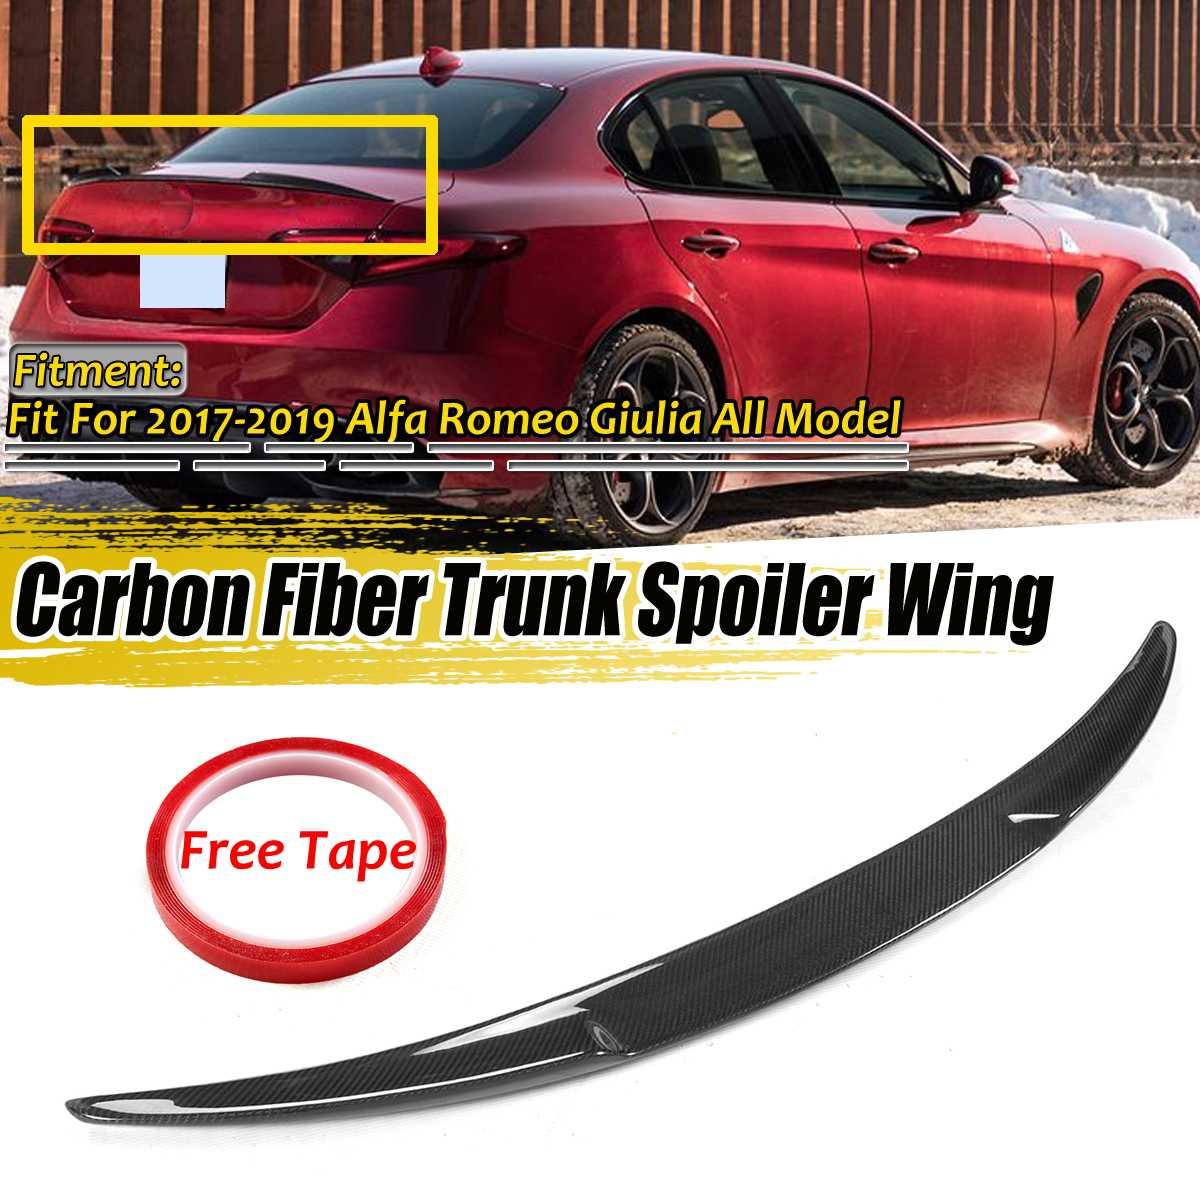 Fibra de carbono Real maletero trasero de coche labio Spoiler labio de ala para Alfa para Romeo Guilia 2017-2019 quatrifoglio estilo Spoiler de carreras